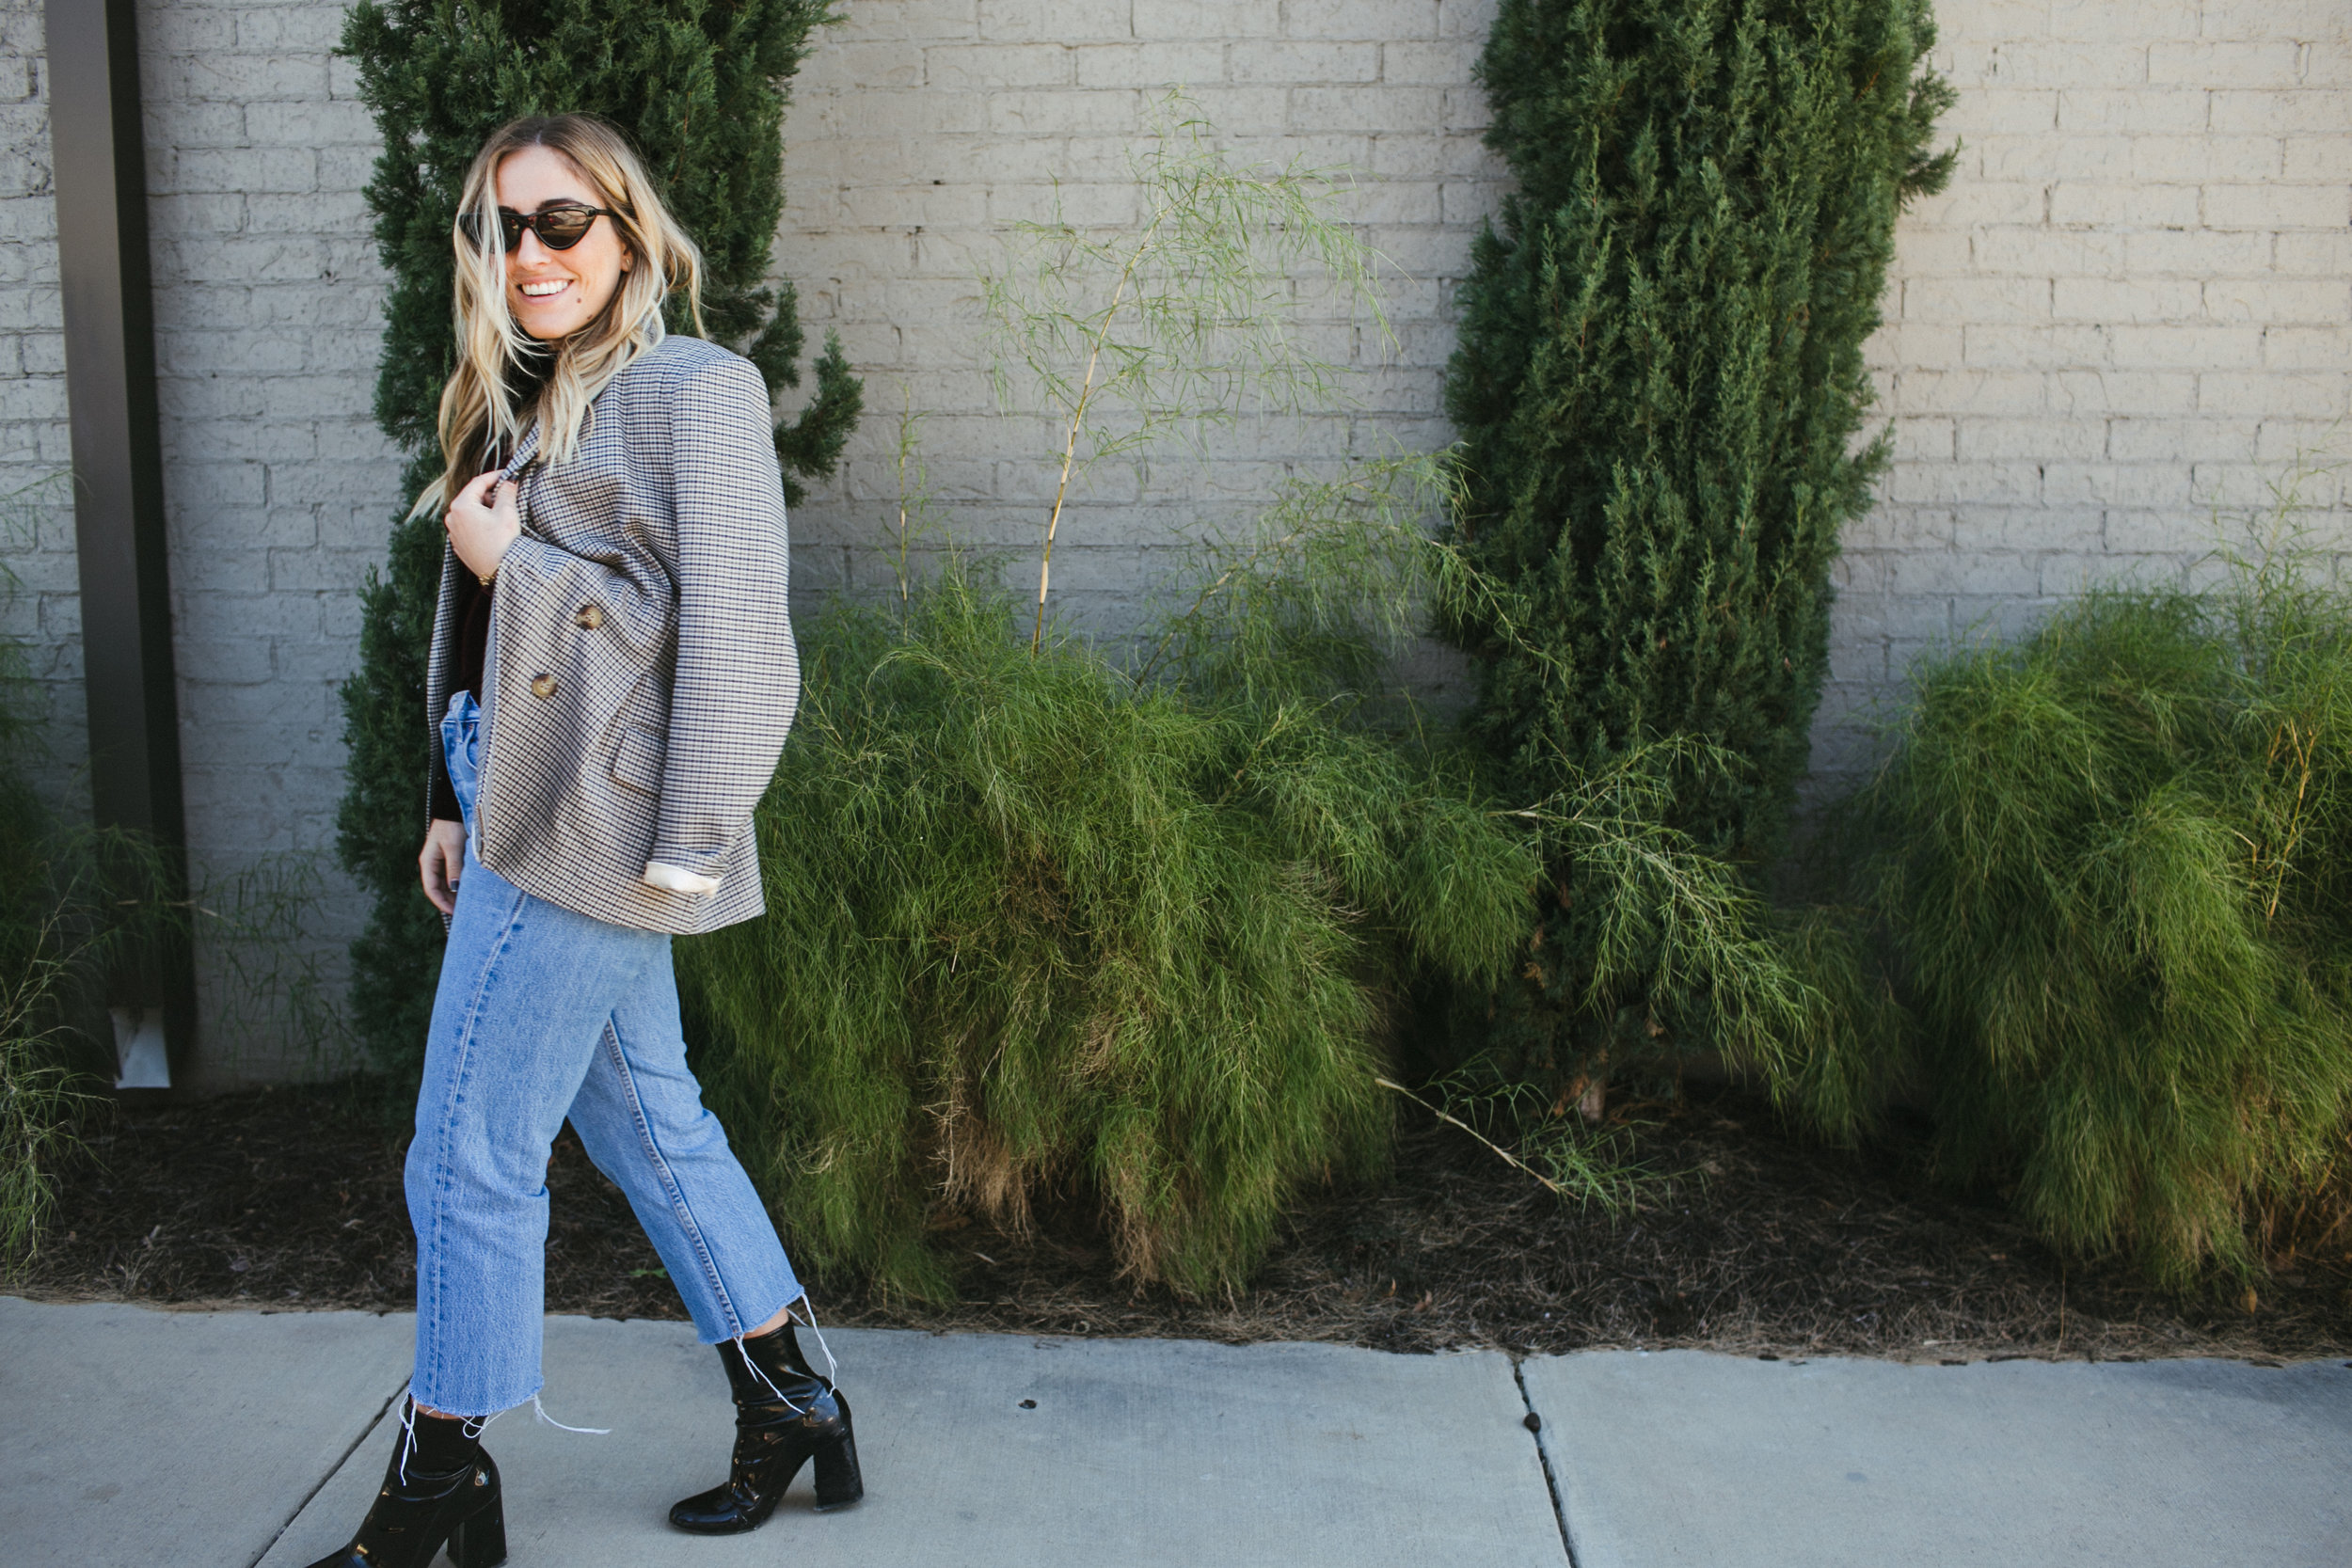 Paige-Newton-Lifestyle-Fashion-Blogger-Influencer-Photography-027.jpg